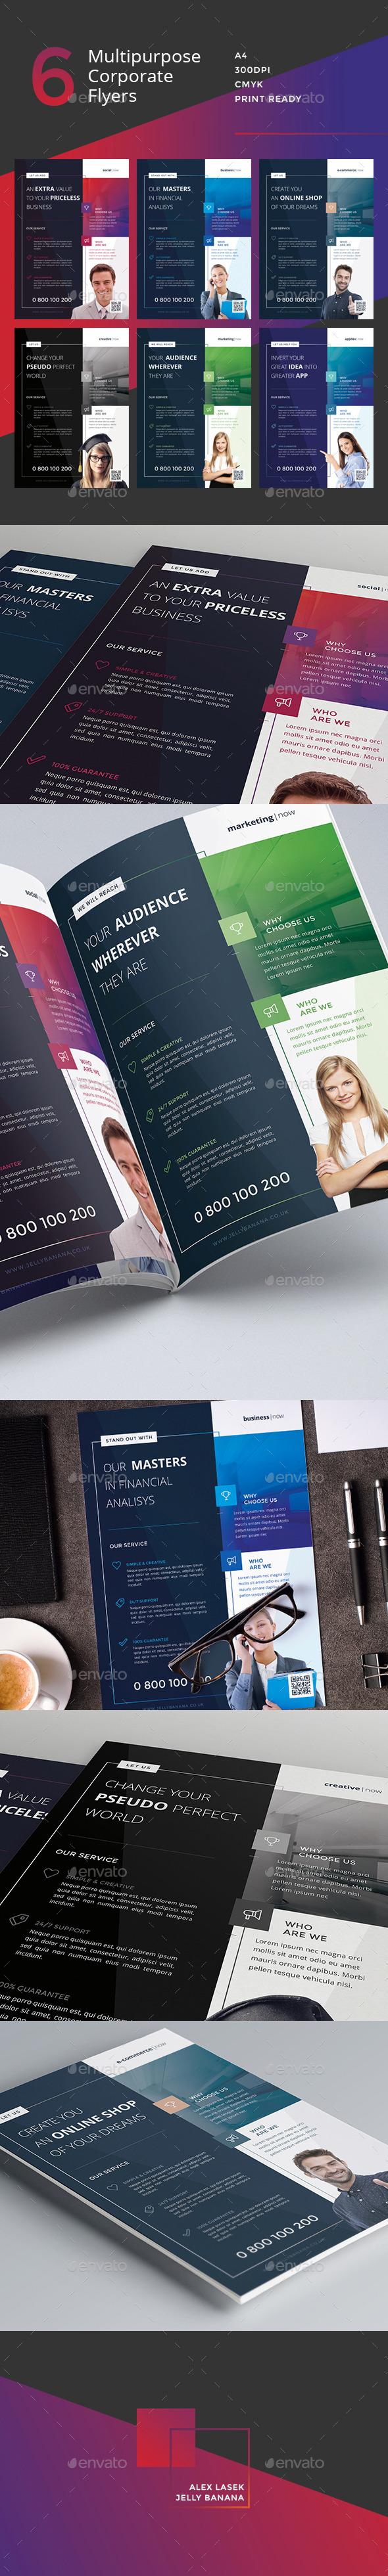 Corporate Flyer - 6 Multipurpose Business Templates vol 2 - Corporate Flyers